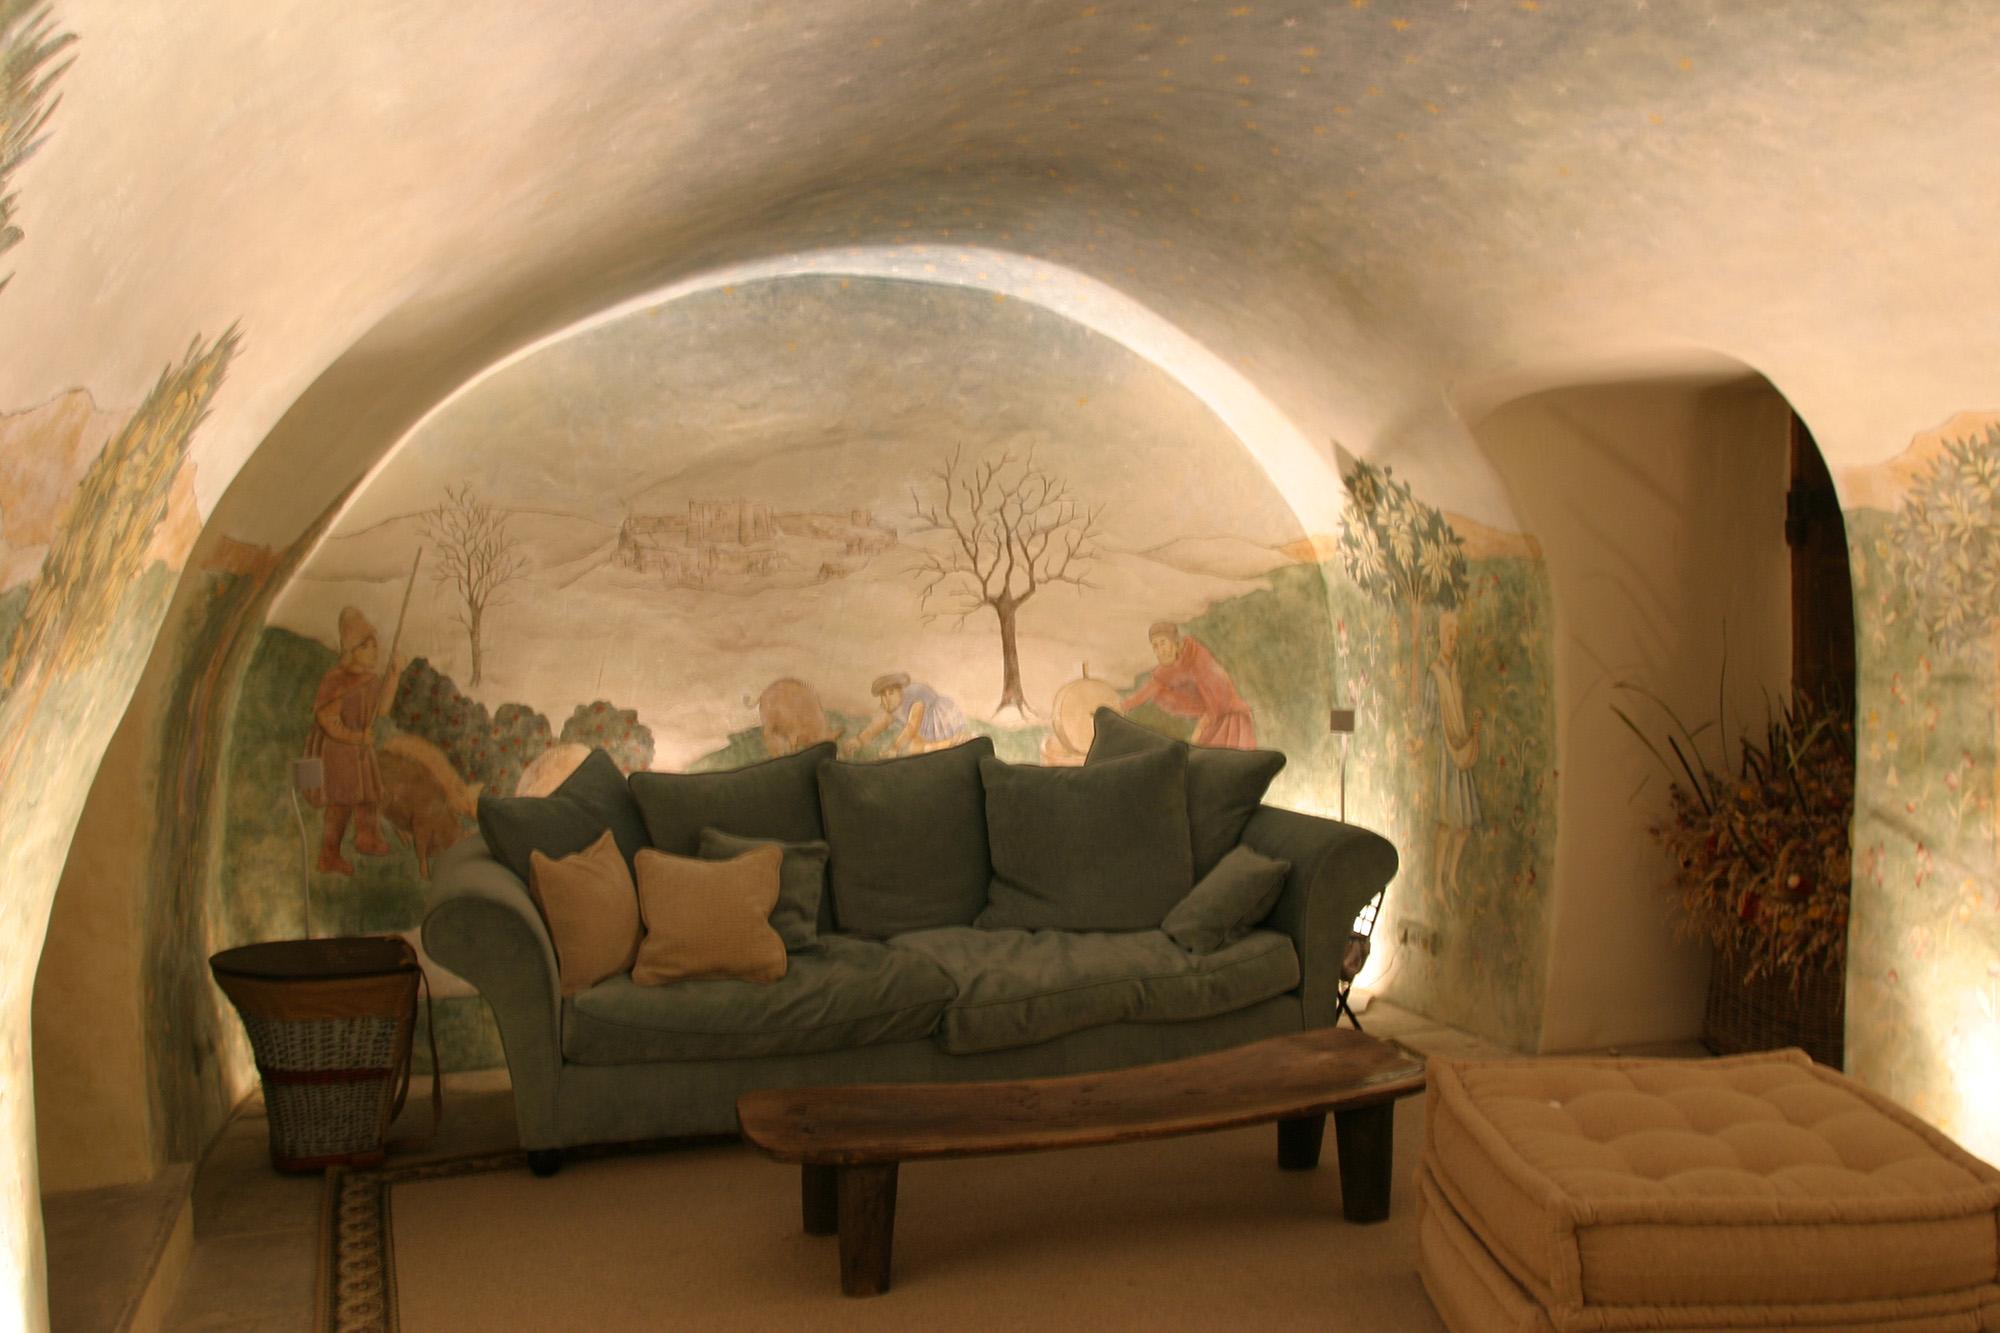 Alu Design Vaison La Romaine la verriere | in villas veritas